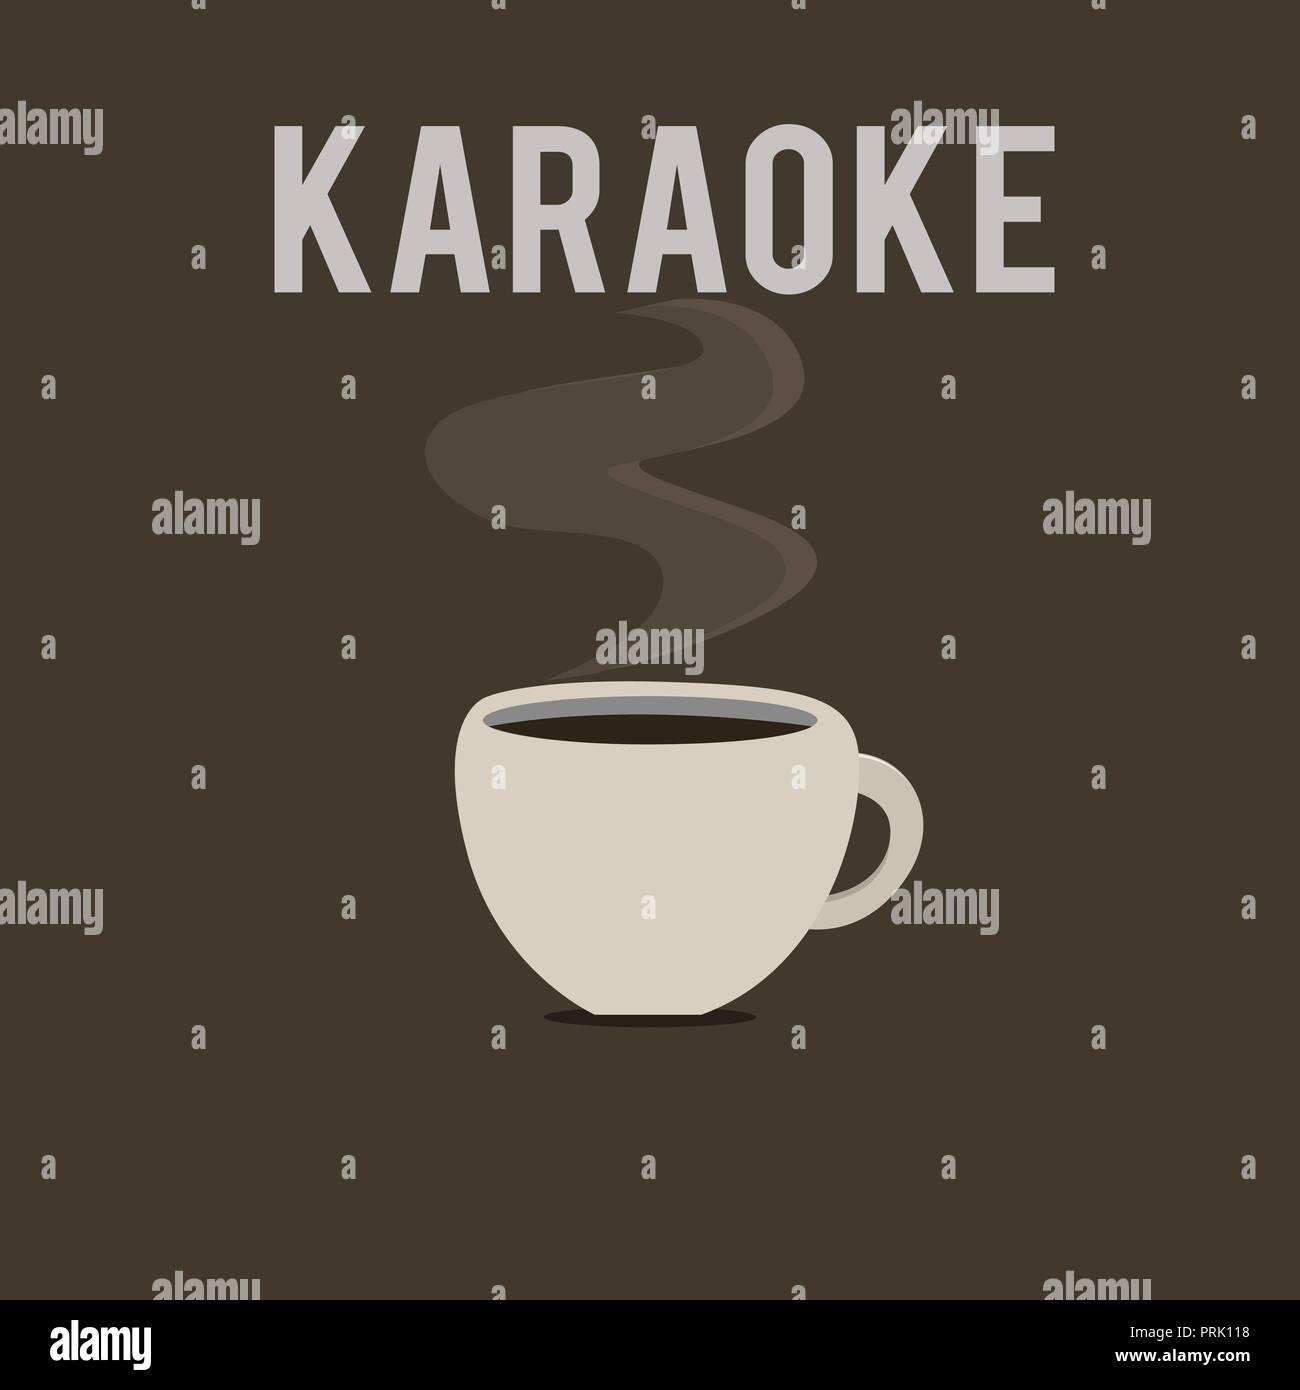 Karaoke Machine Stock Photos & Karaoke Machine Stock Images